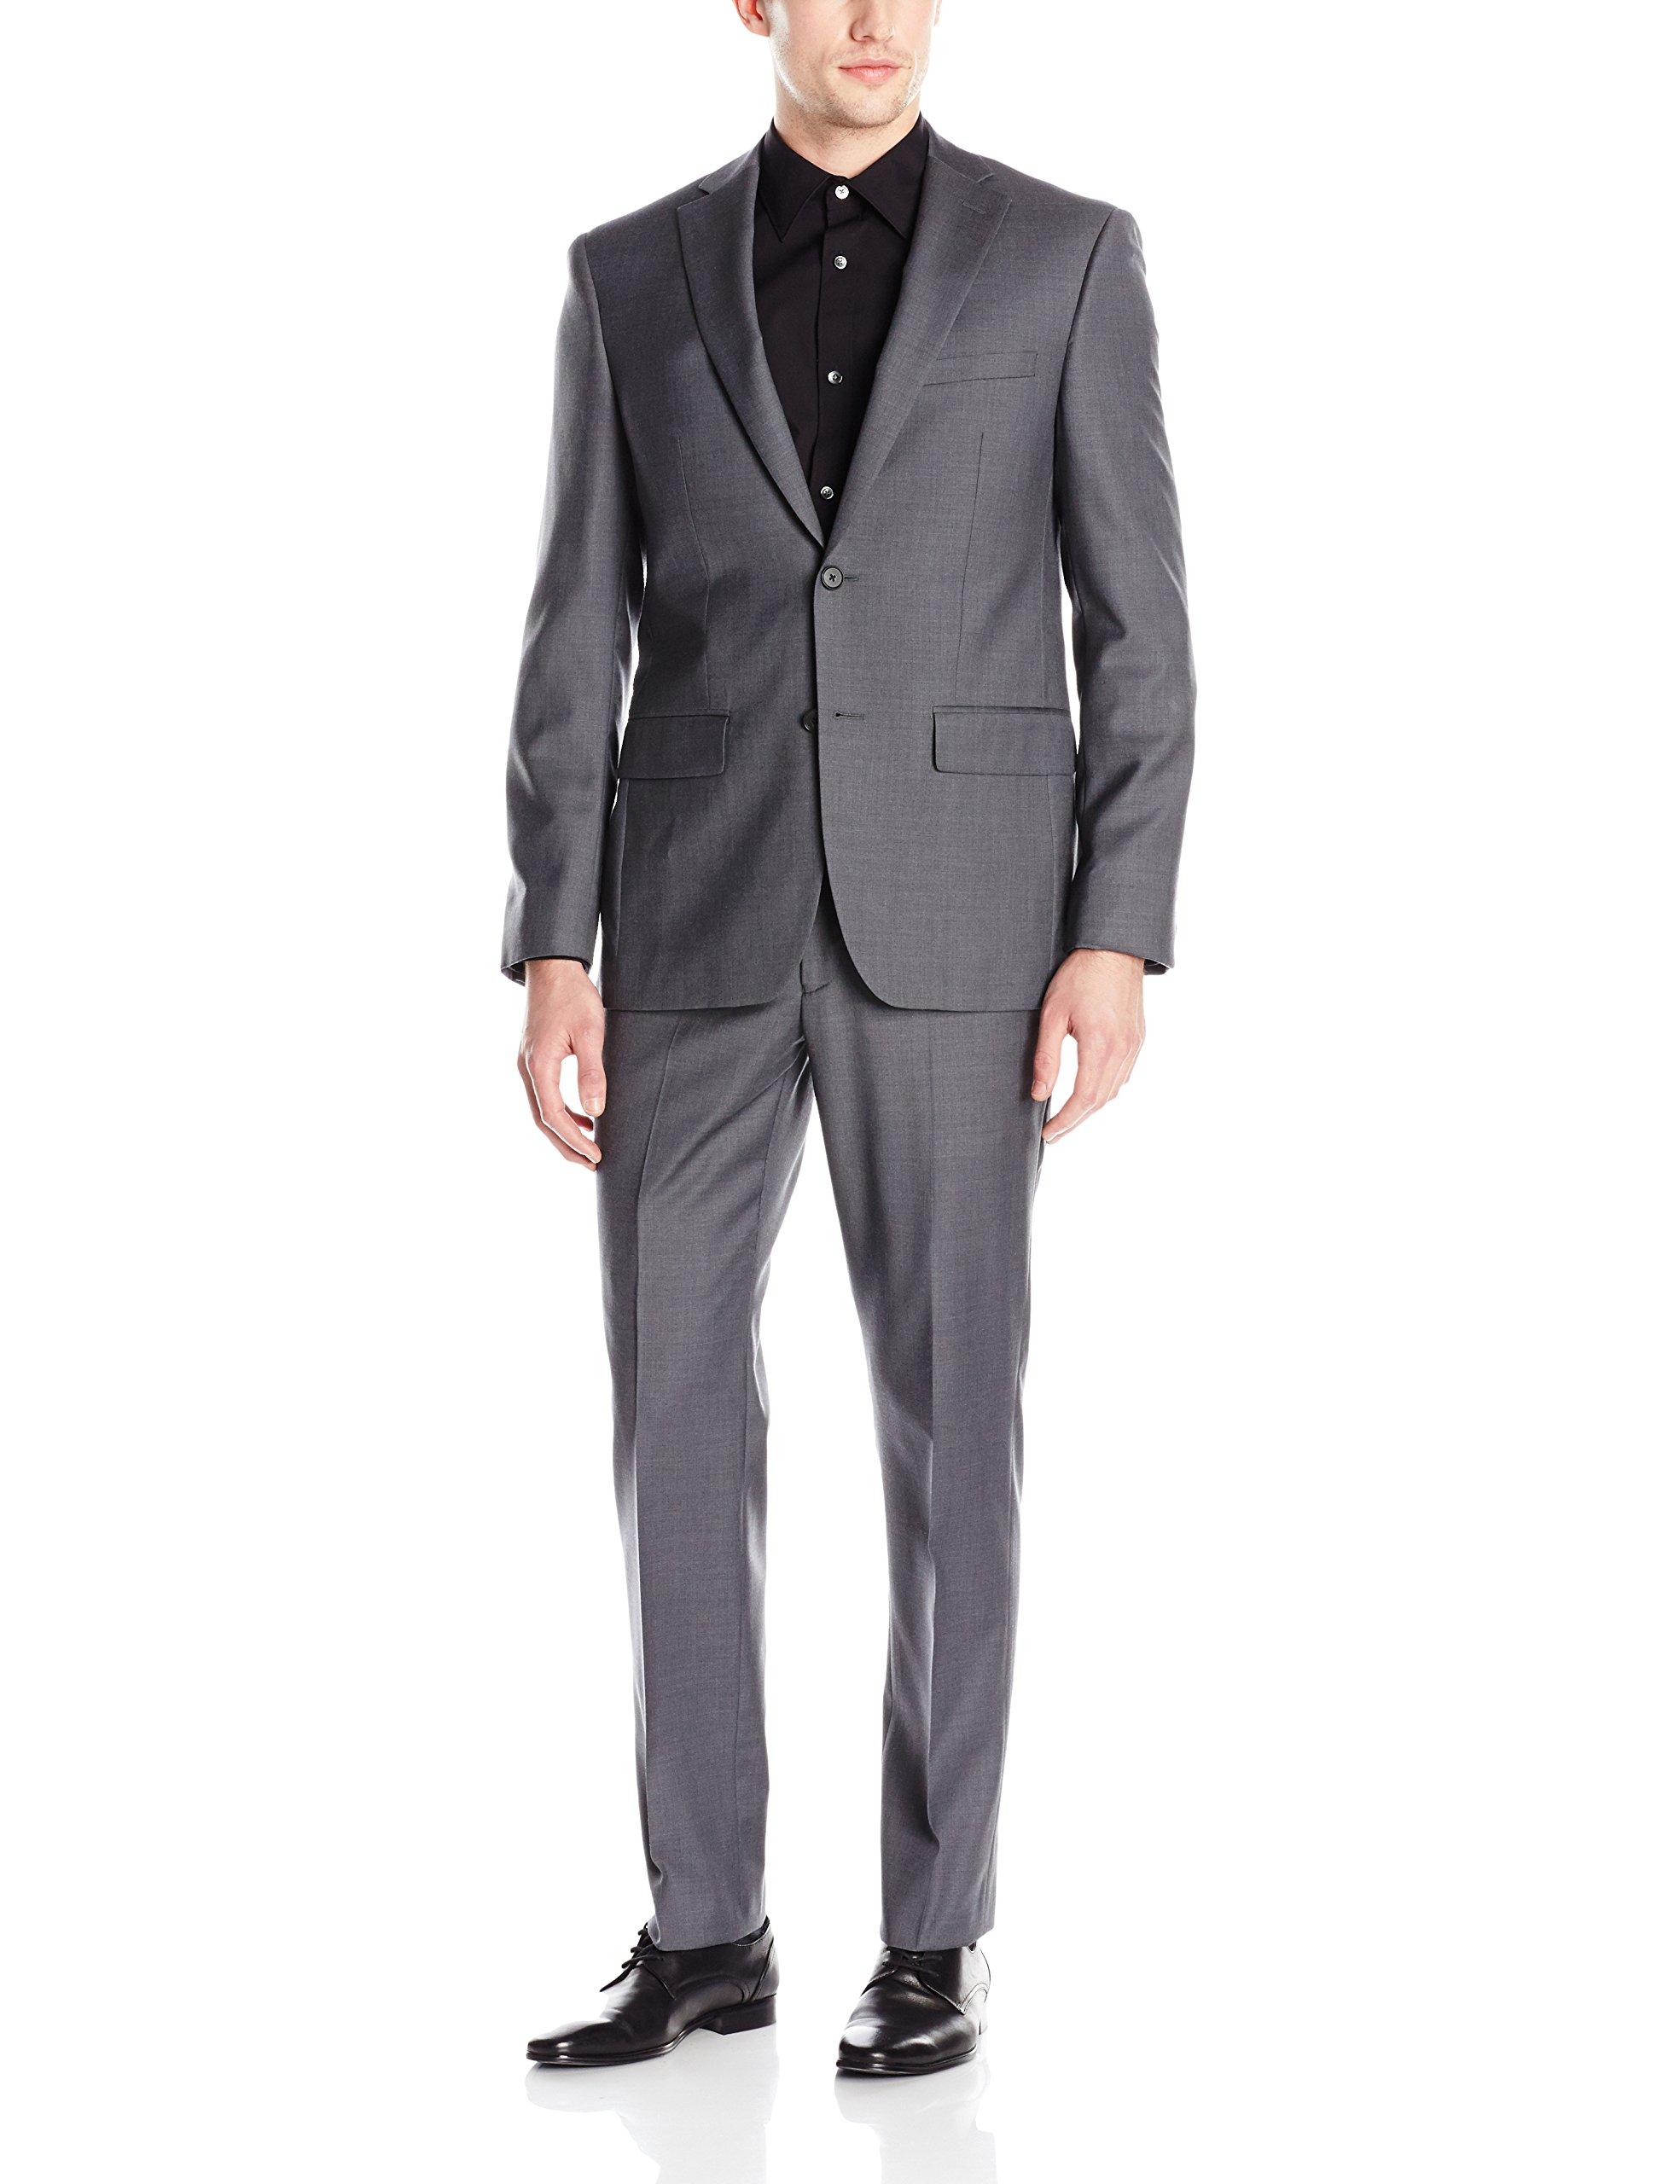 DKNY Men's Dominic Slim Fit Single Breast 2 Button Suit, Grey, 44 Long